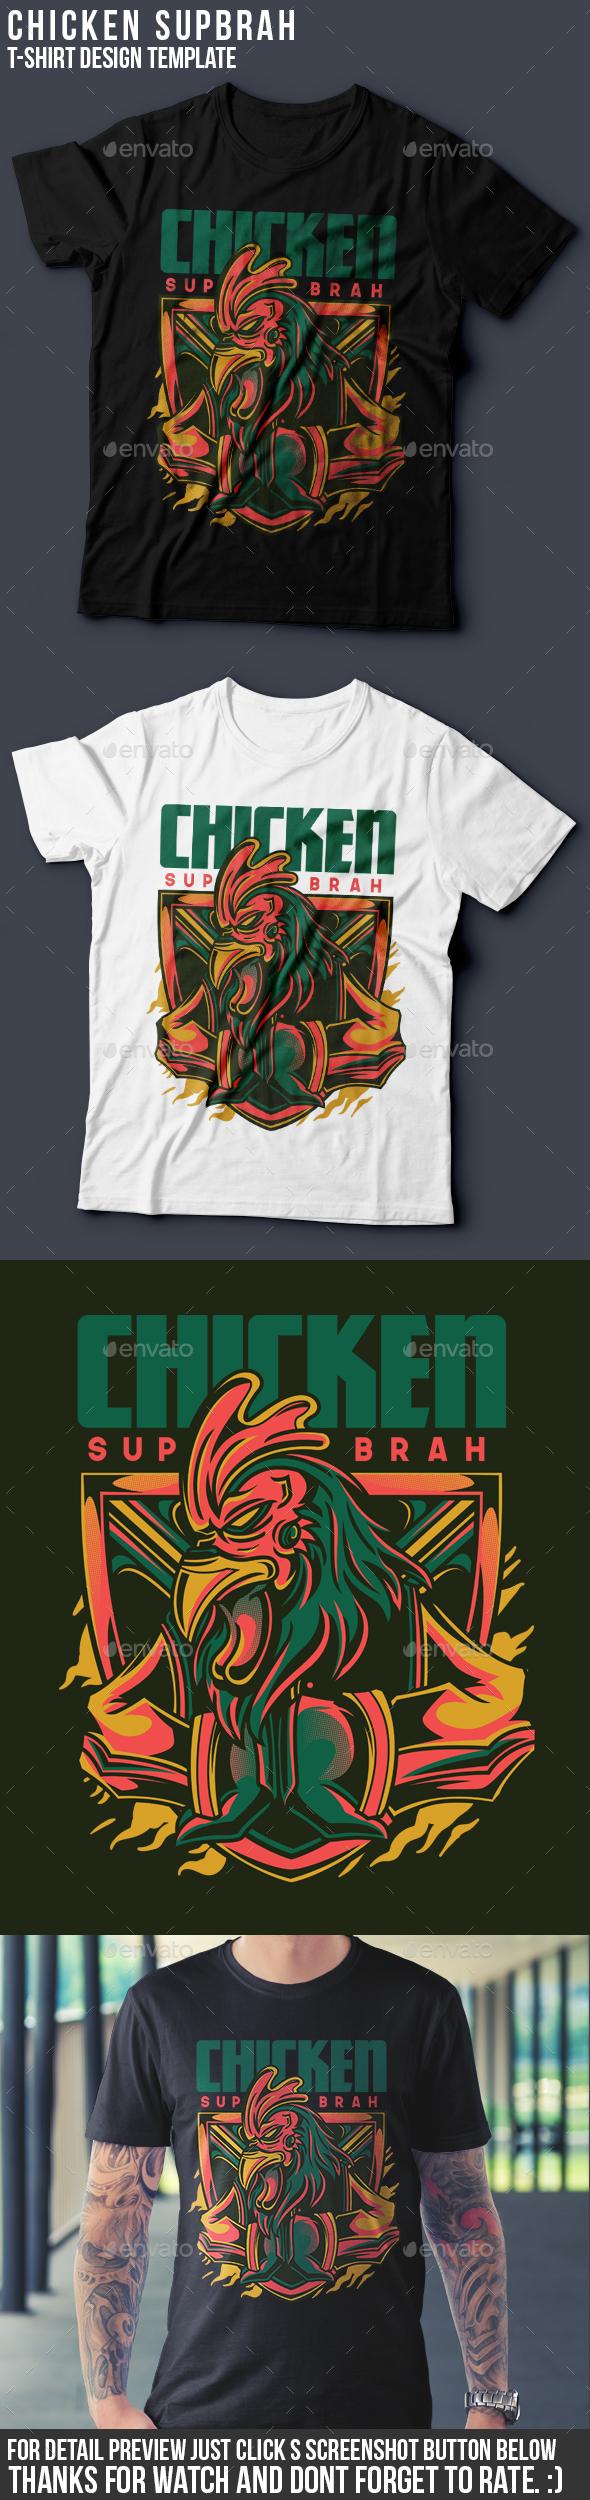 Chicken Sup Brah T-Shirt Design - Funny Designs